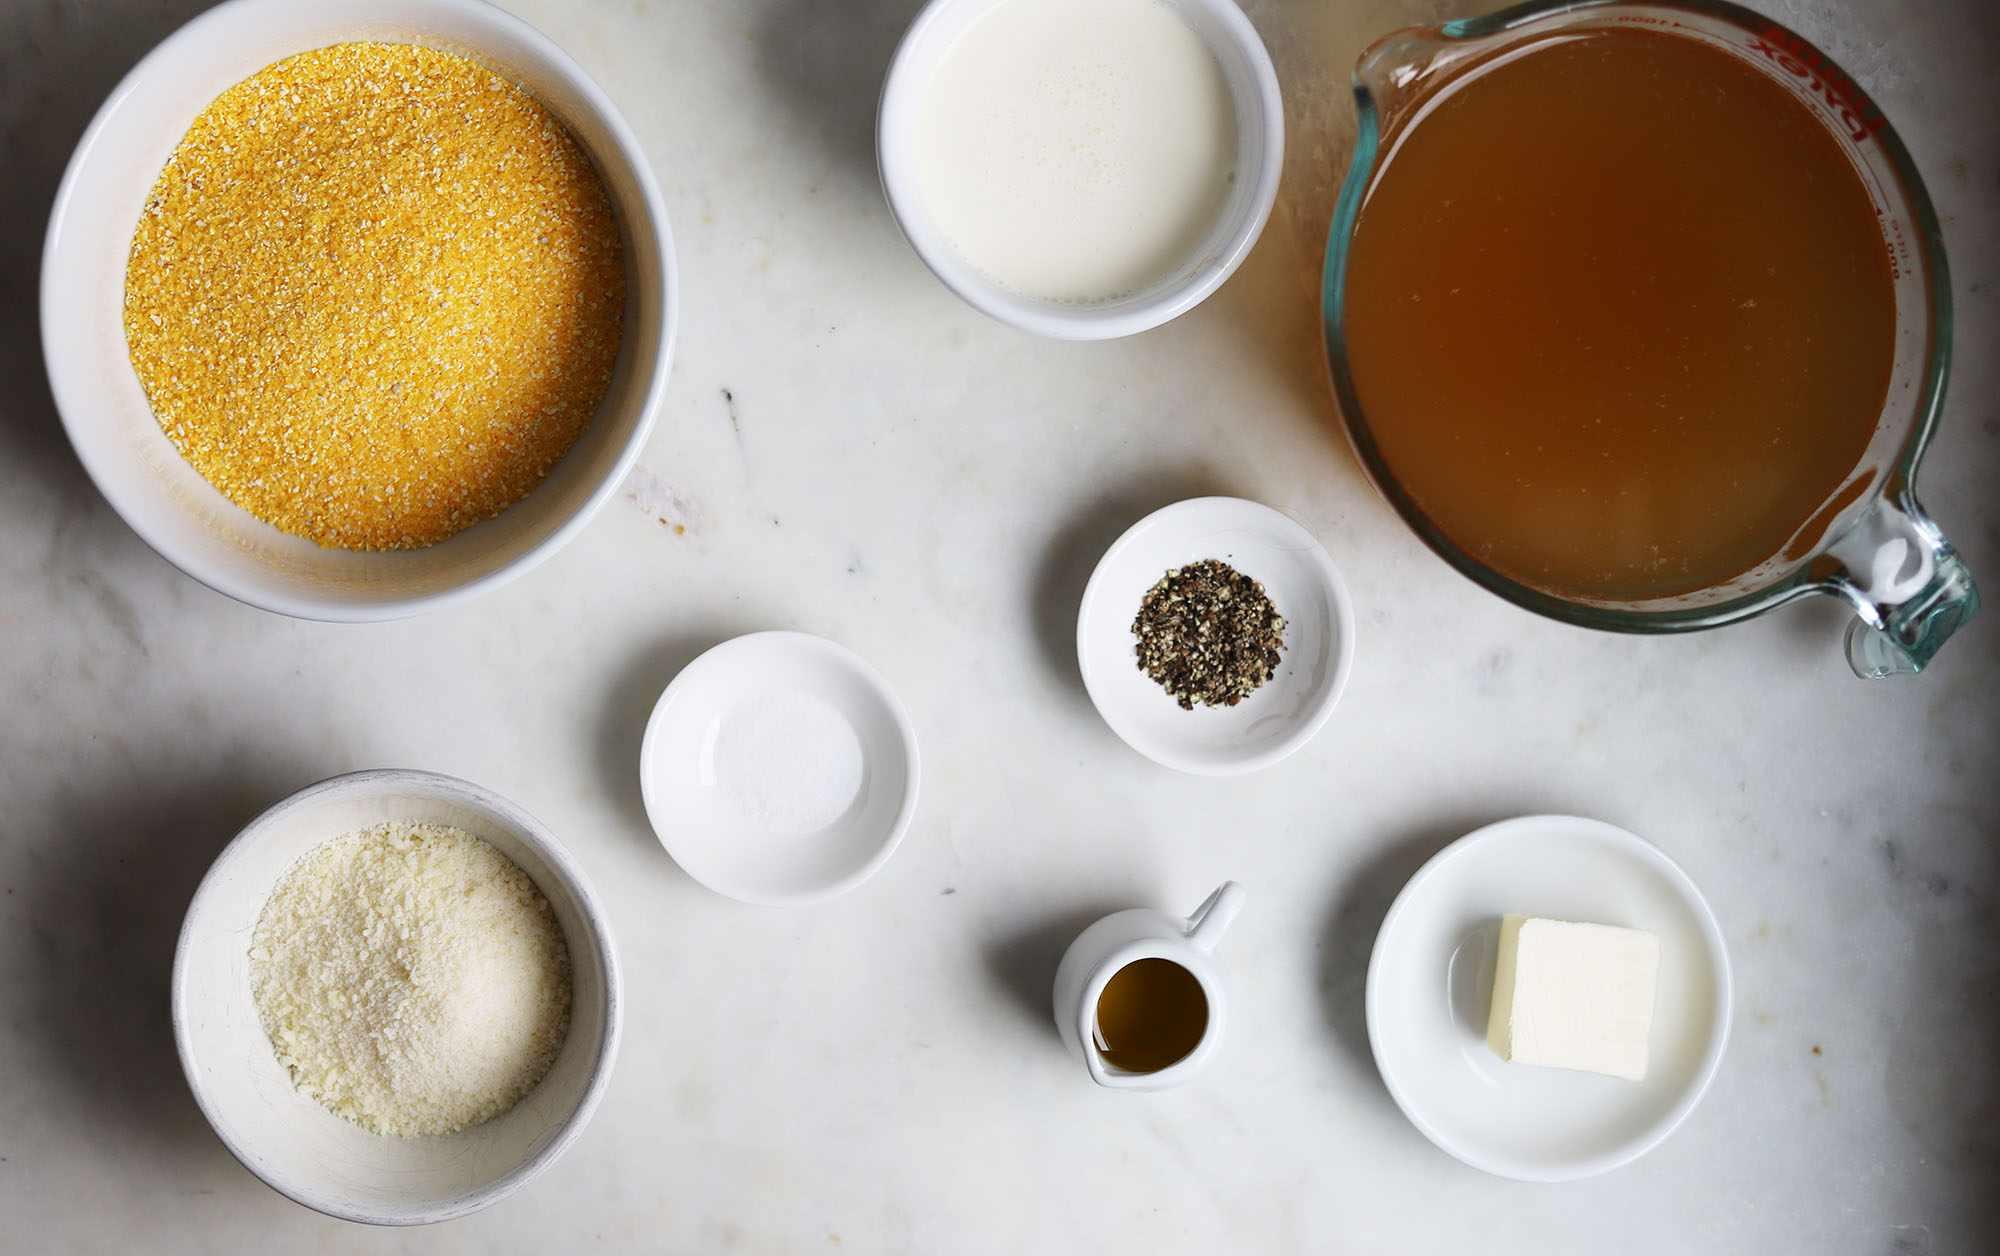 polenta cake ingredients